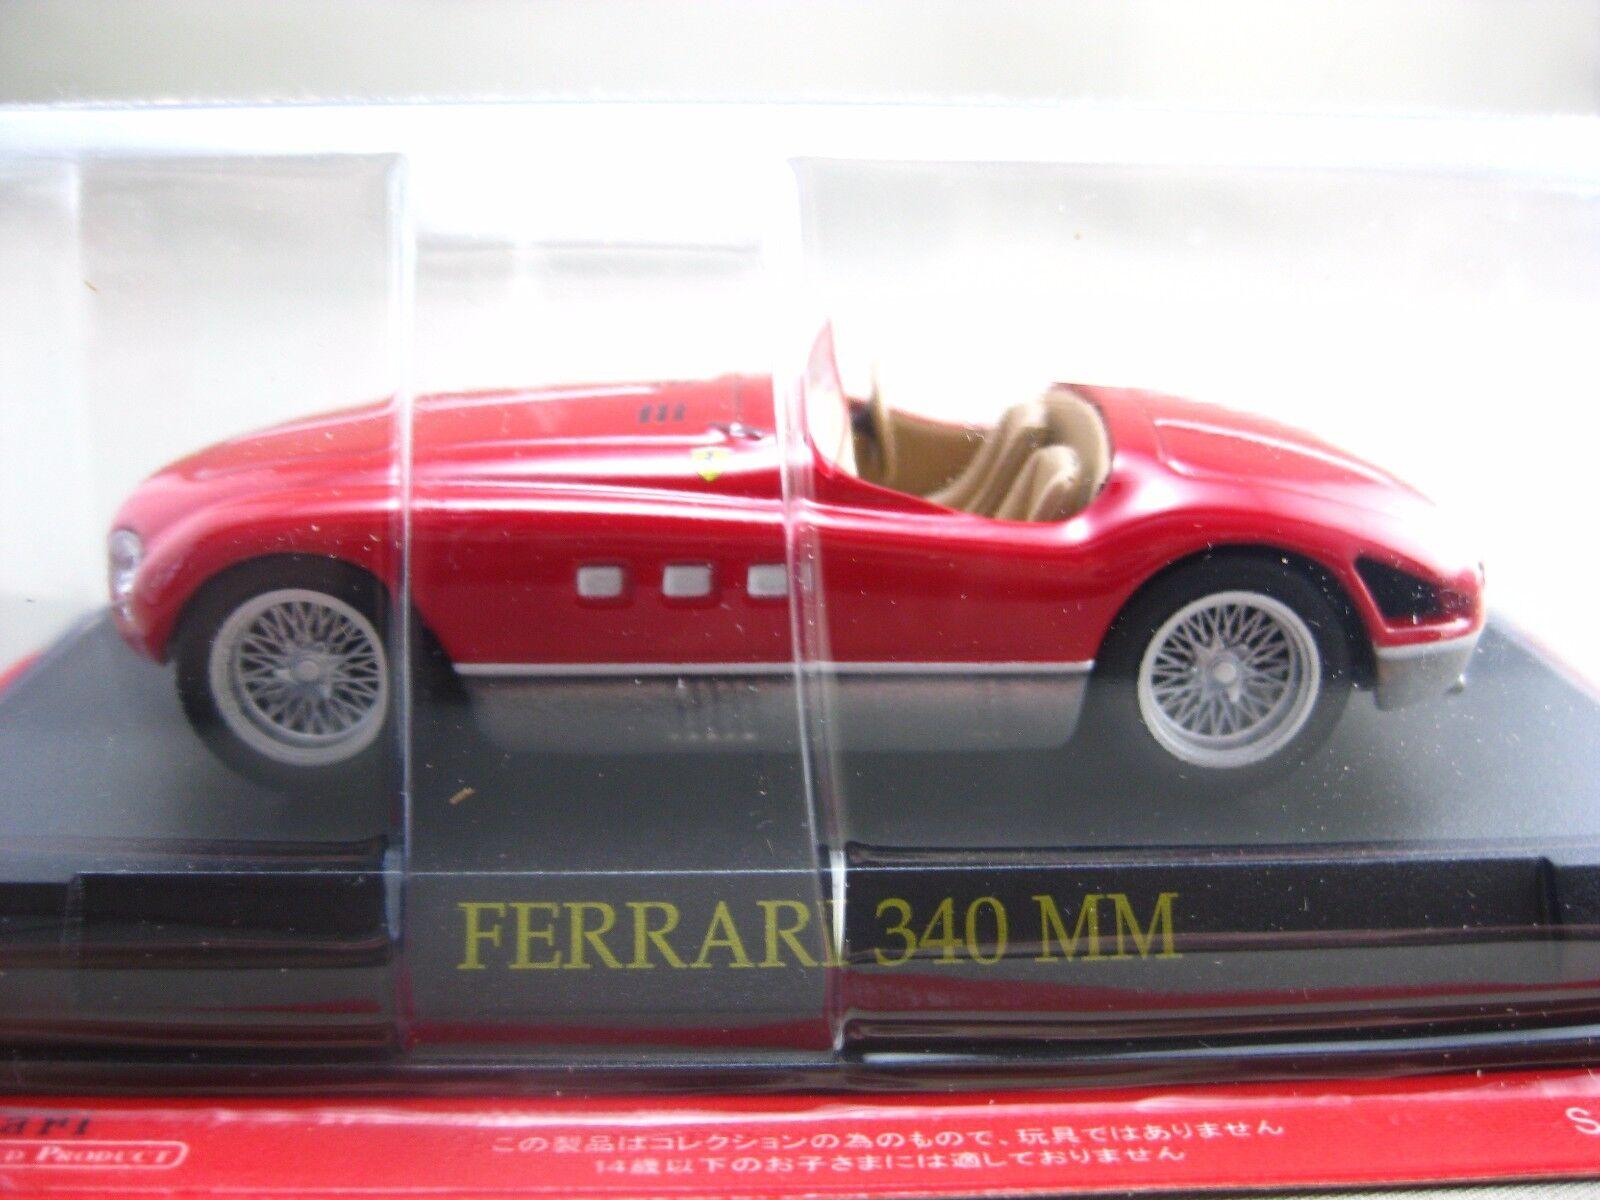 Ferrari 340 MM hachette 1 43 Diecast car Vol.45